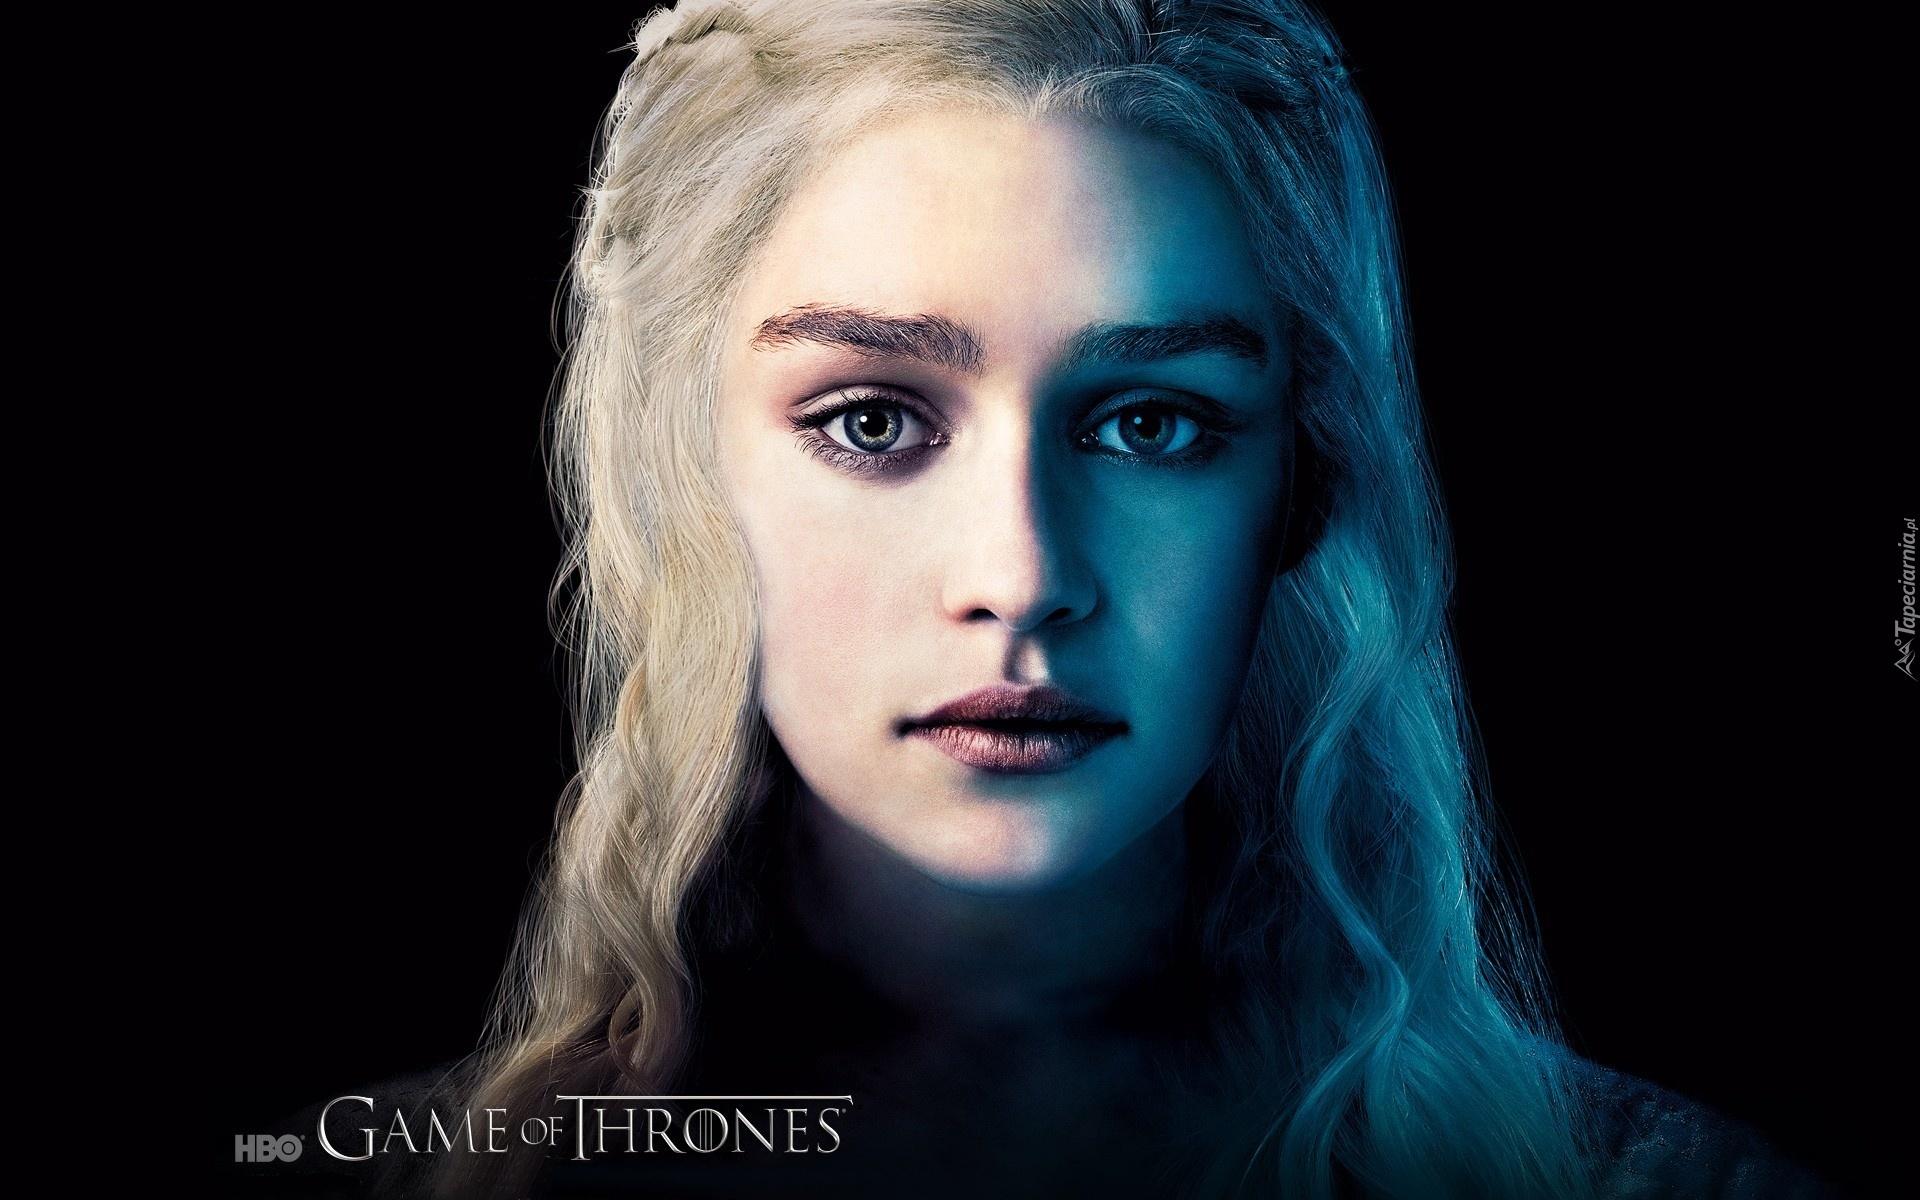 gra o tron, game of thrones, daenerys - emilia clarke